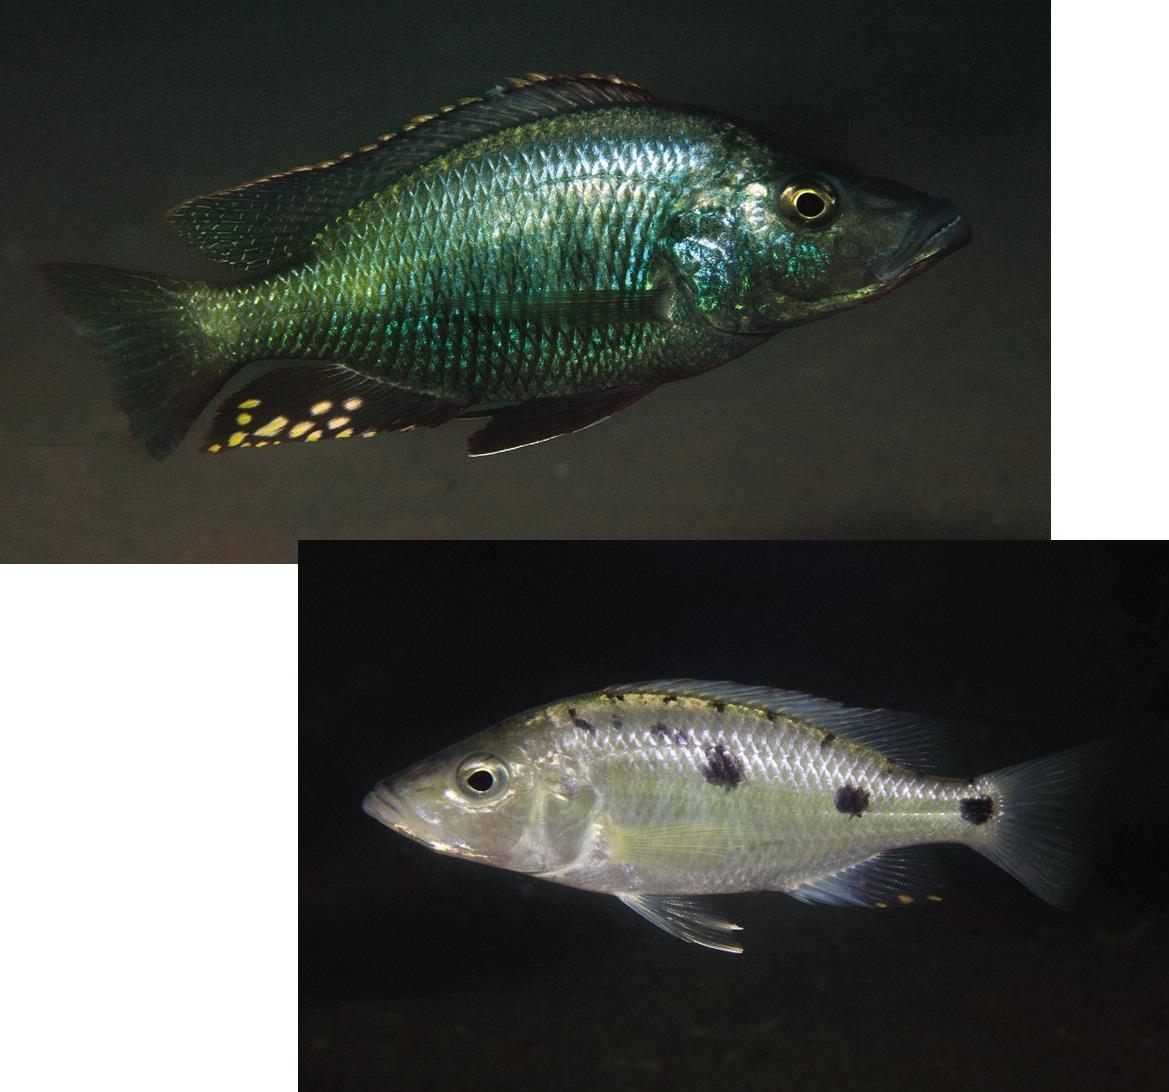 Stigmatochromis macrorhynchos s melanchros 2 new for New species of fish